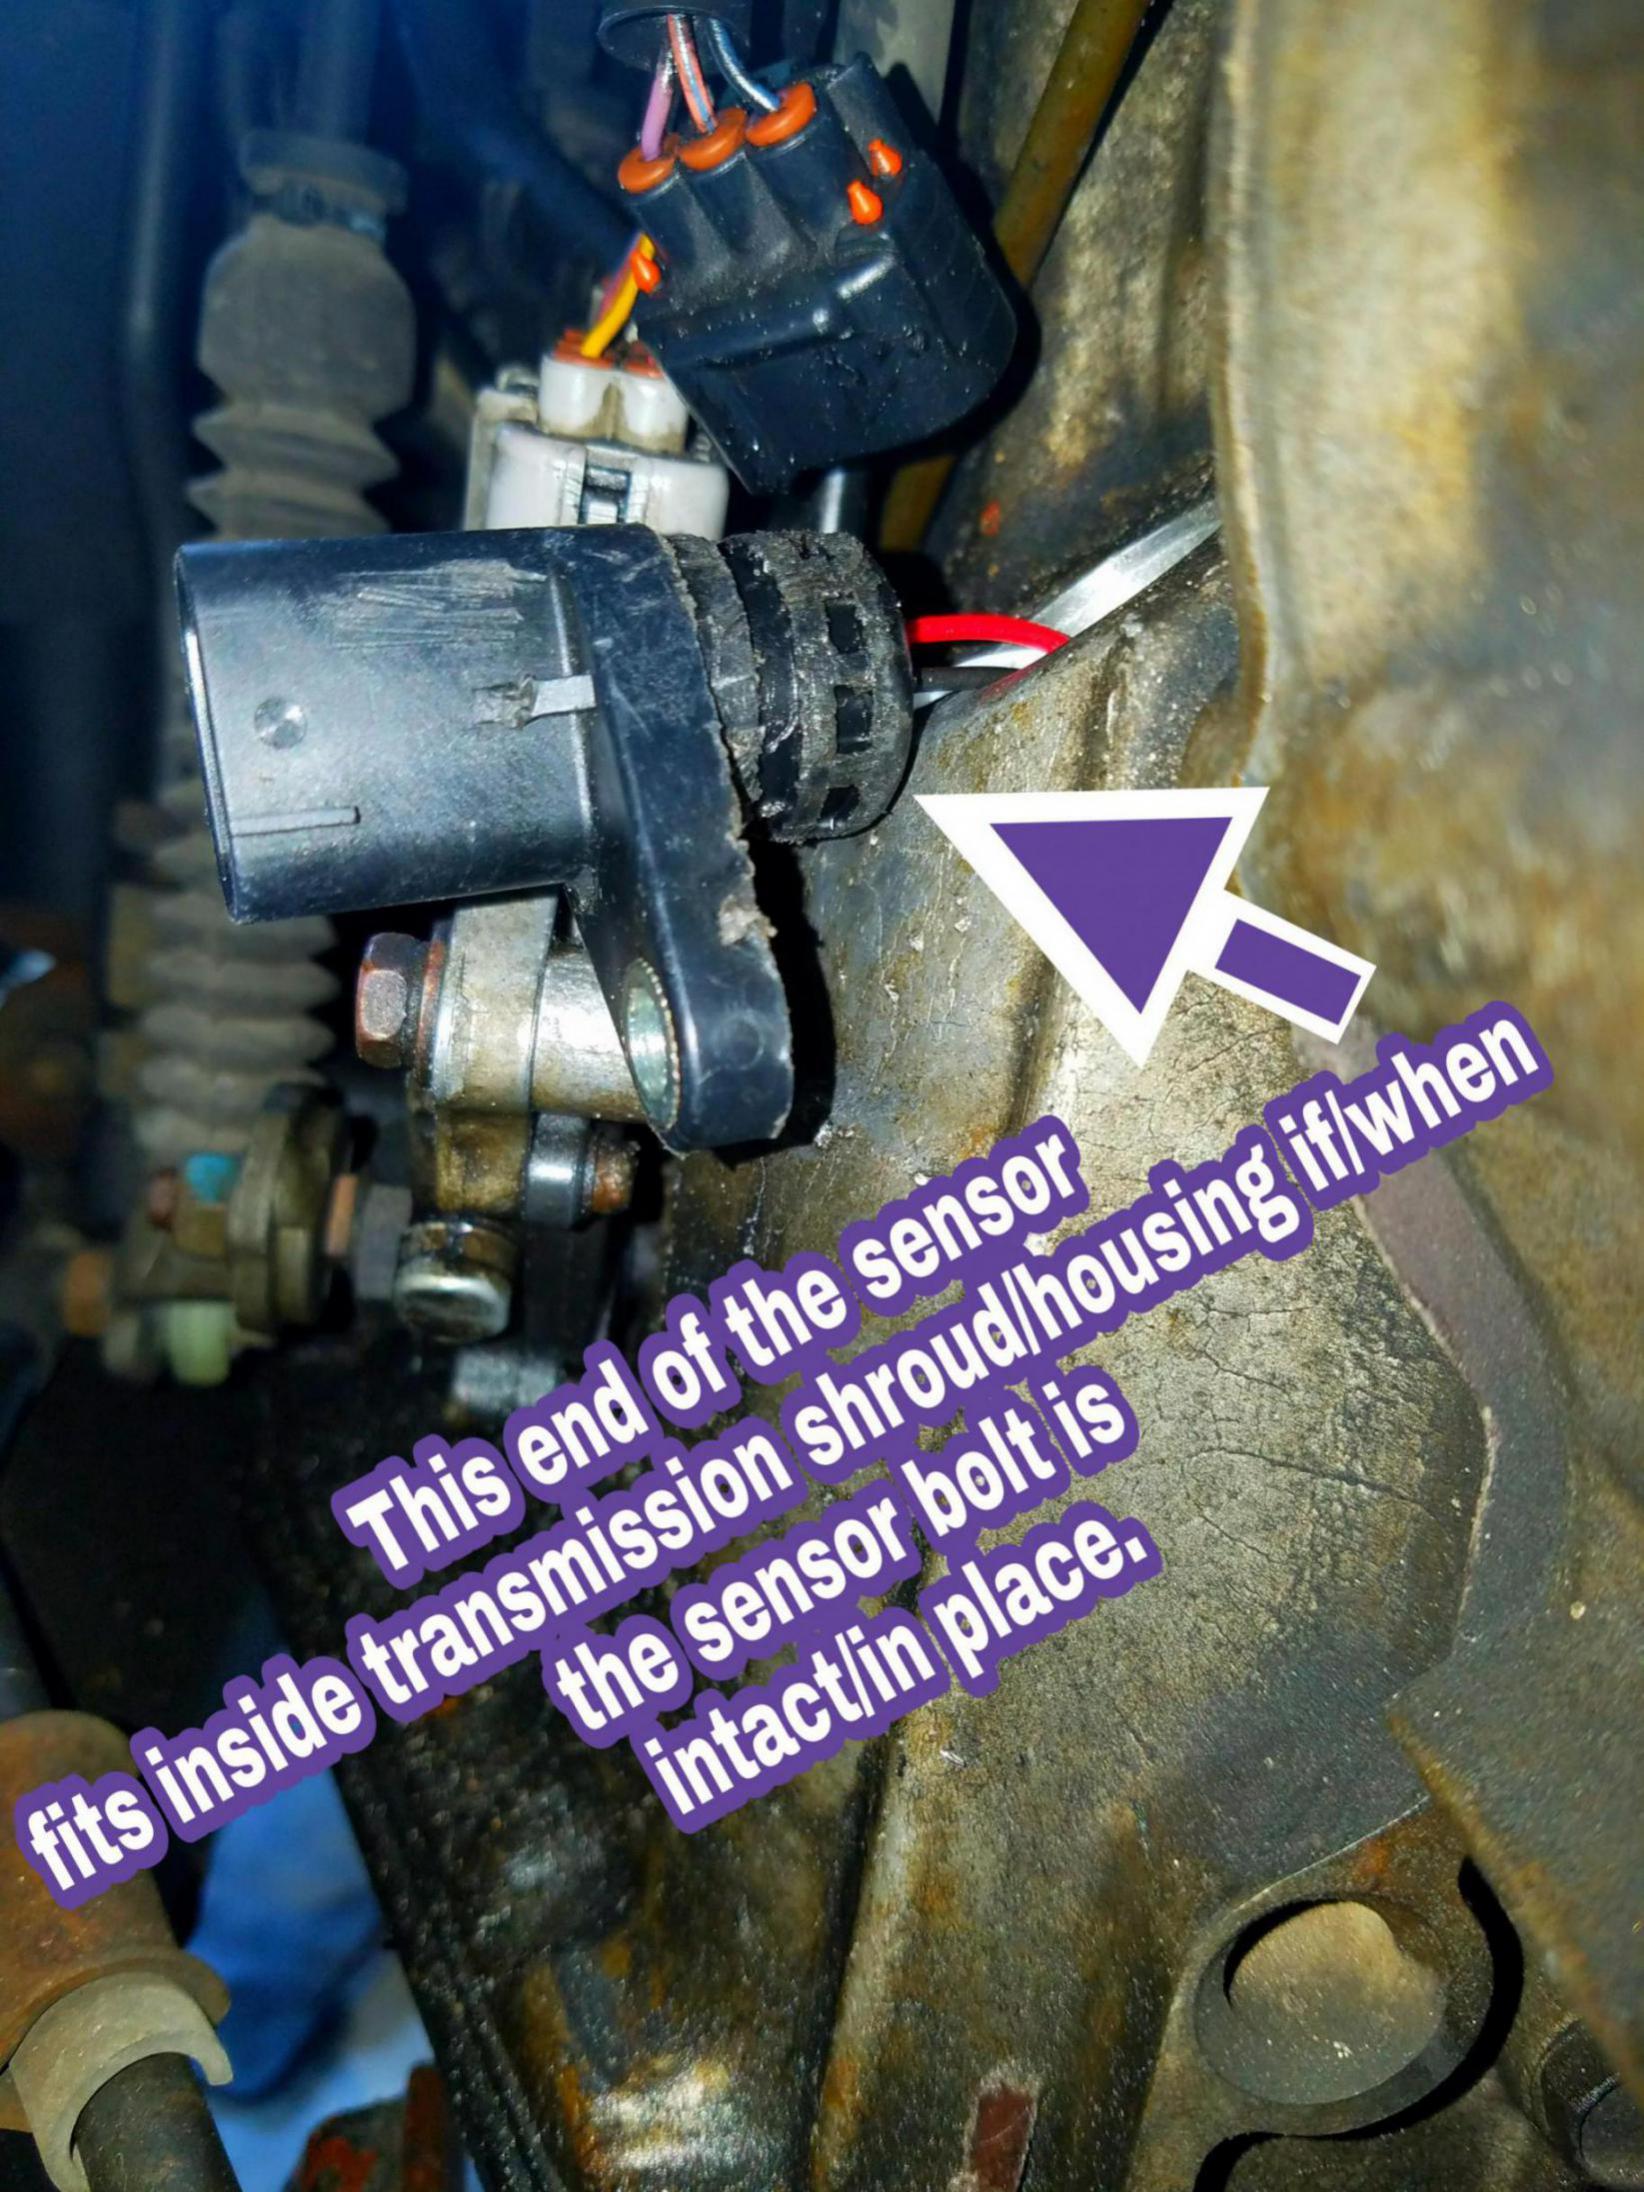 Toyota Sienna Service Manual: Vehicle Speed Sensor Malfunction